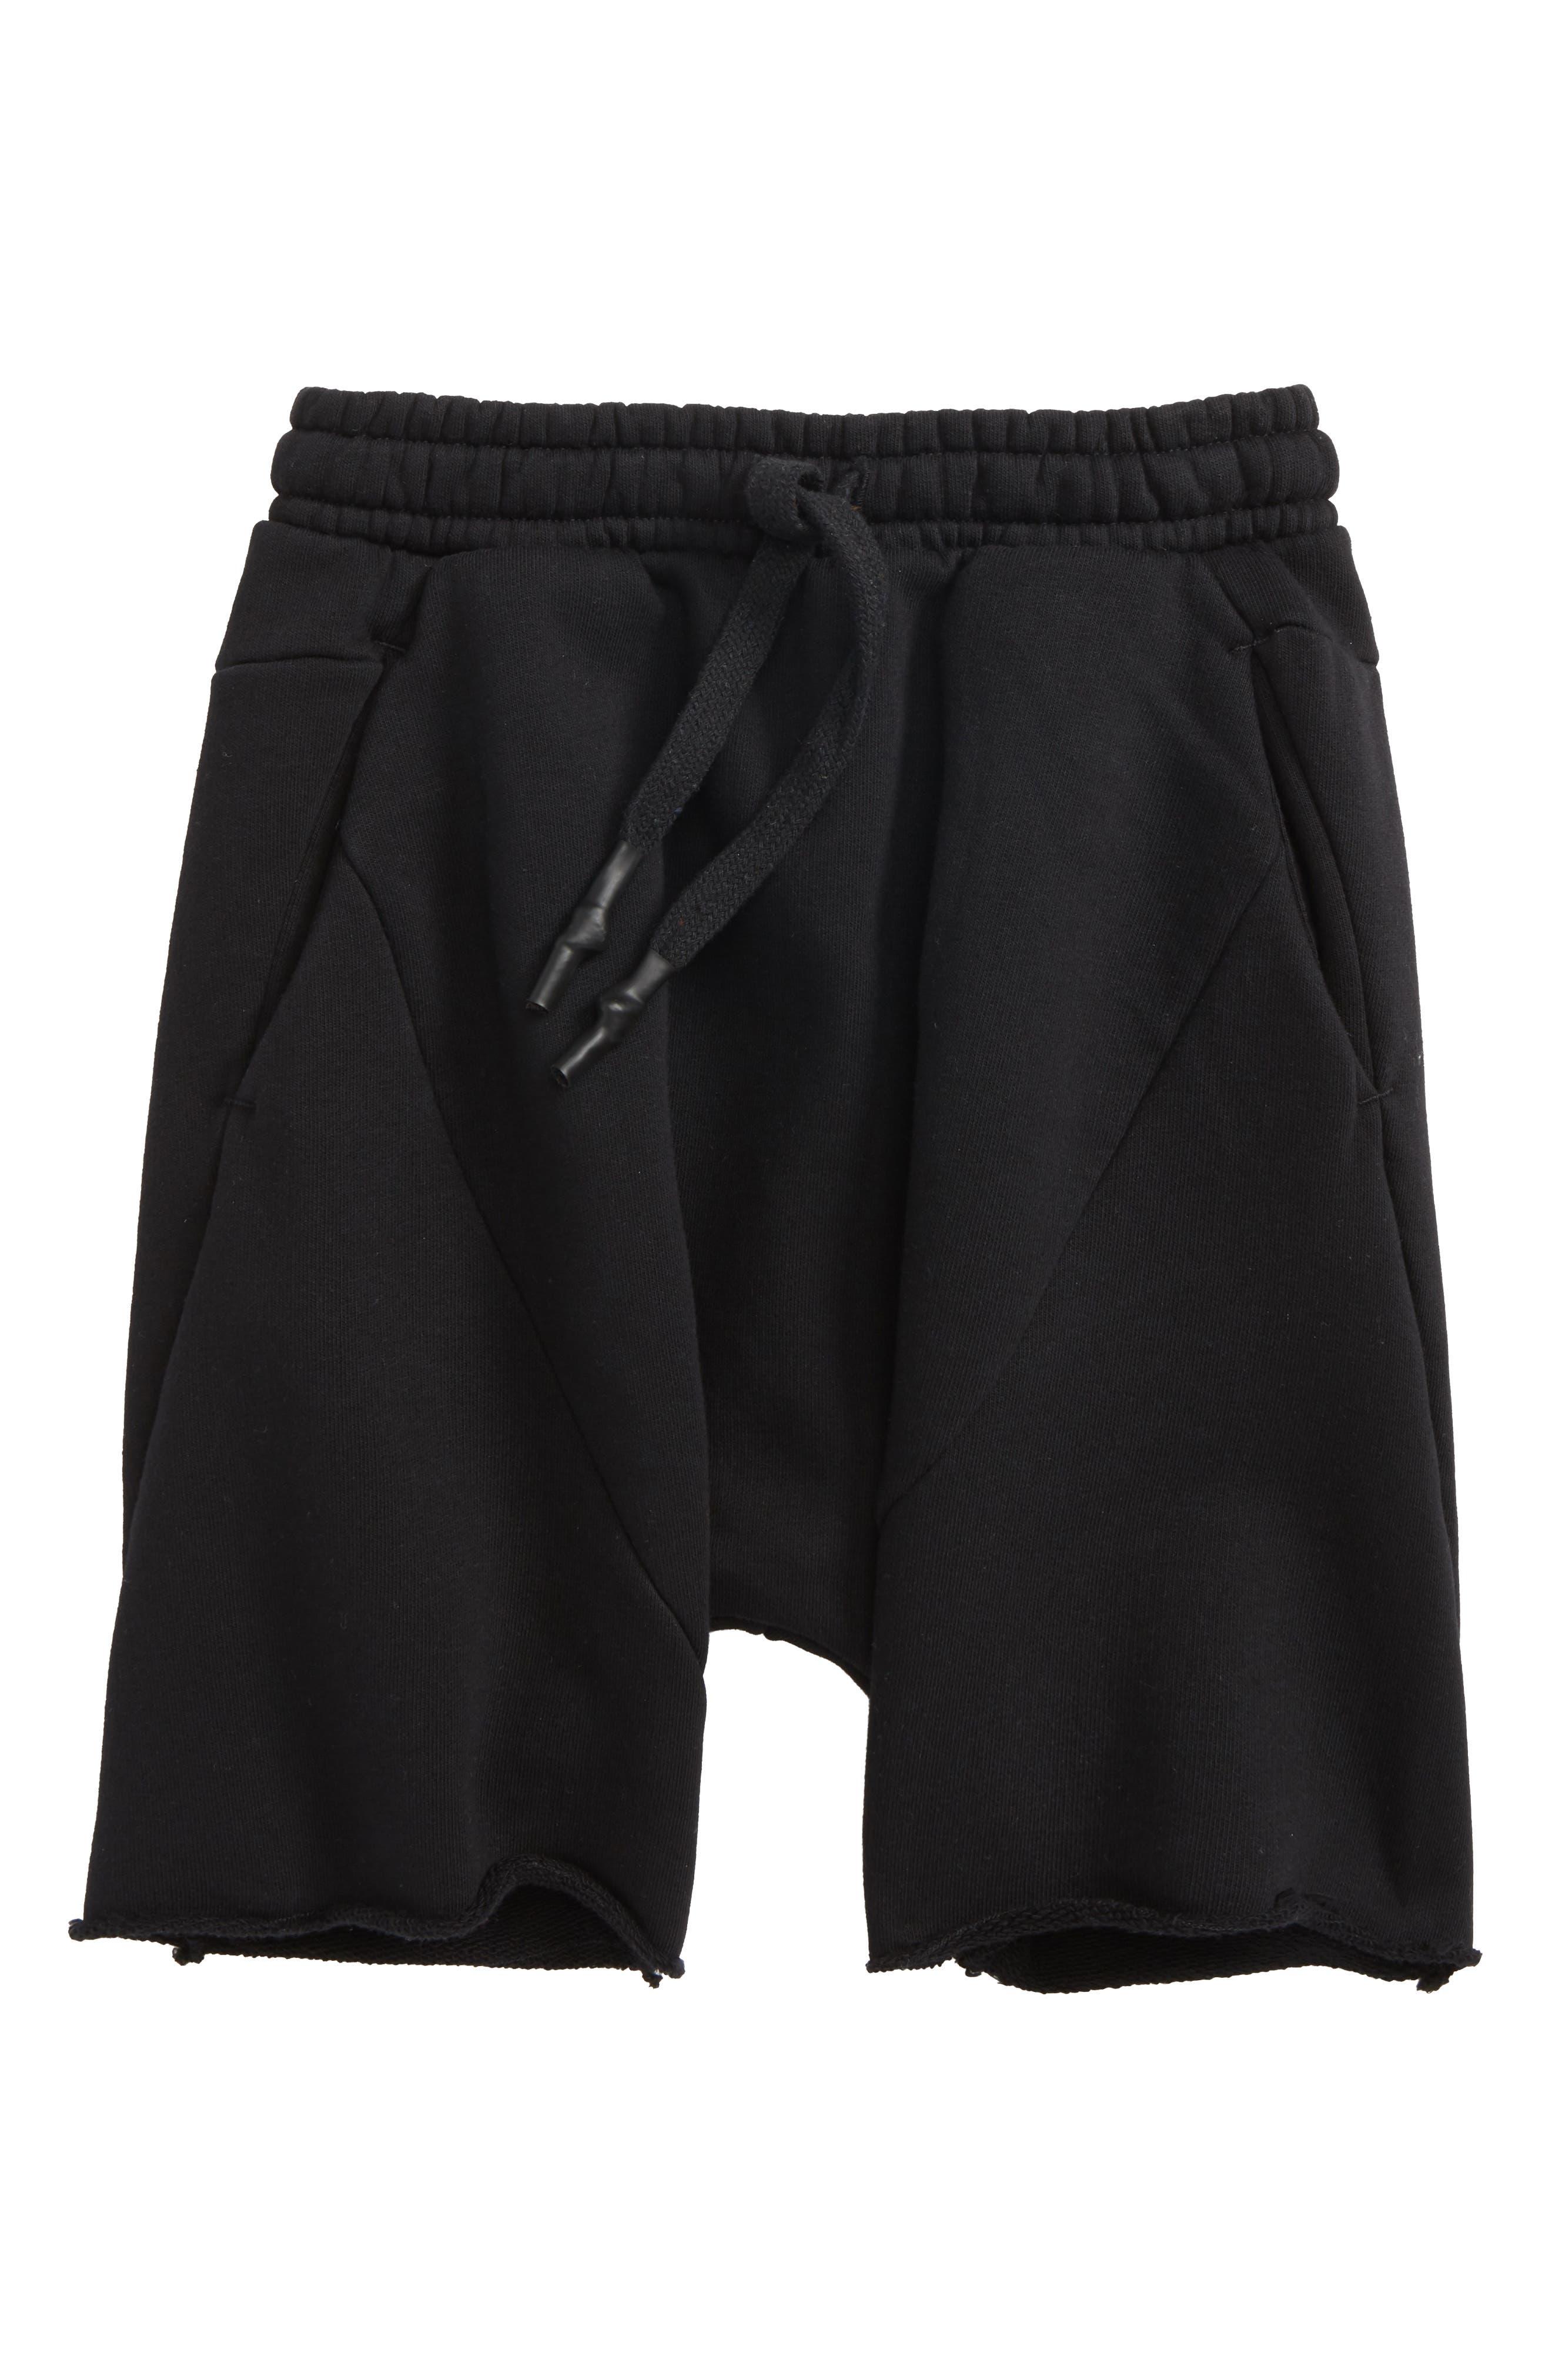 NUNUNU Knit Shorts, Main, color, 001